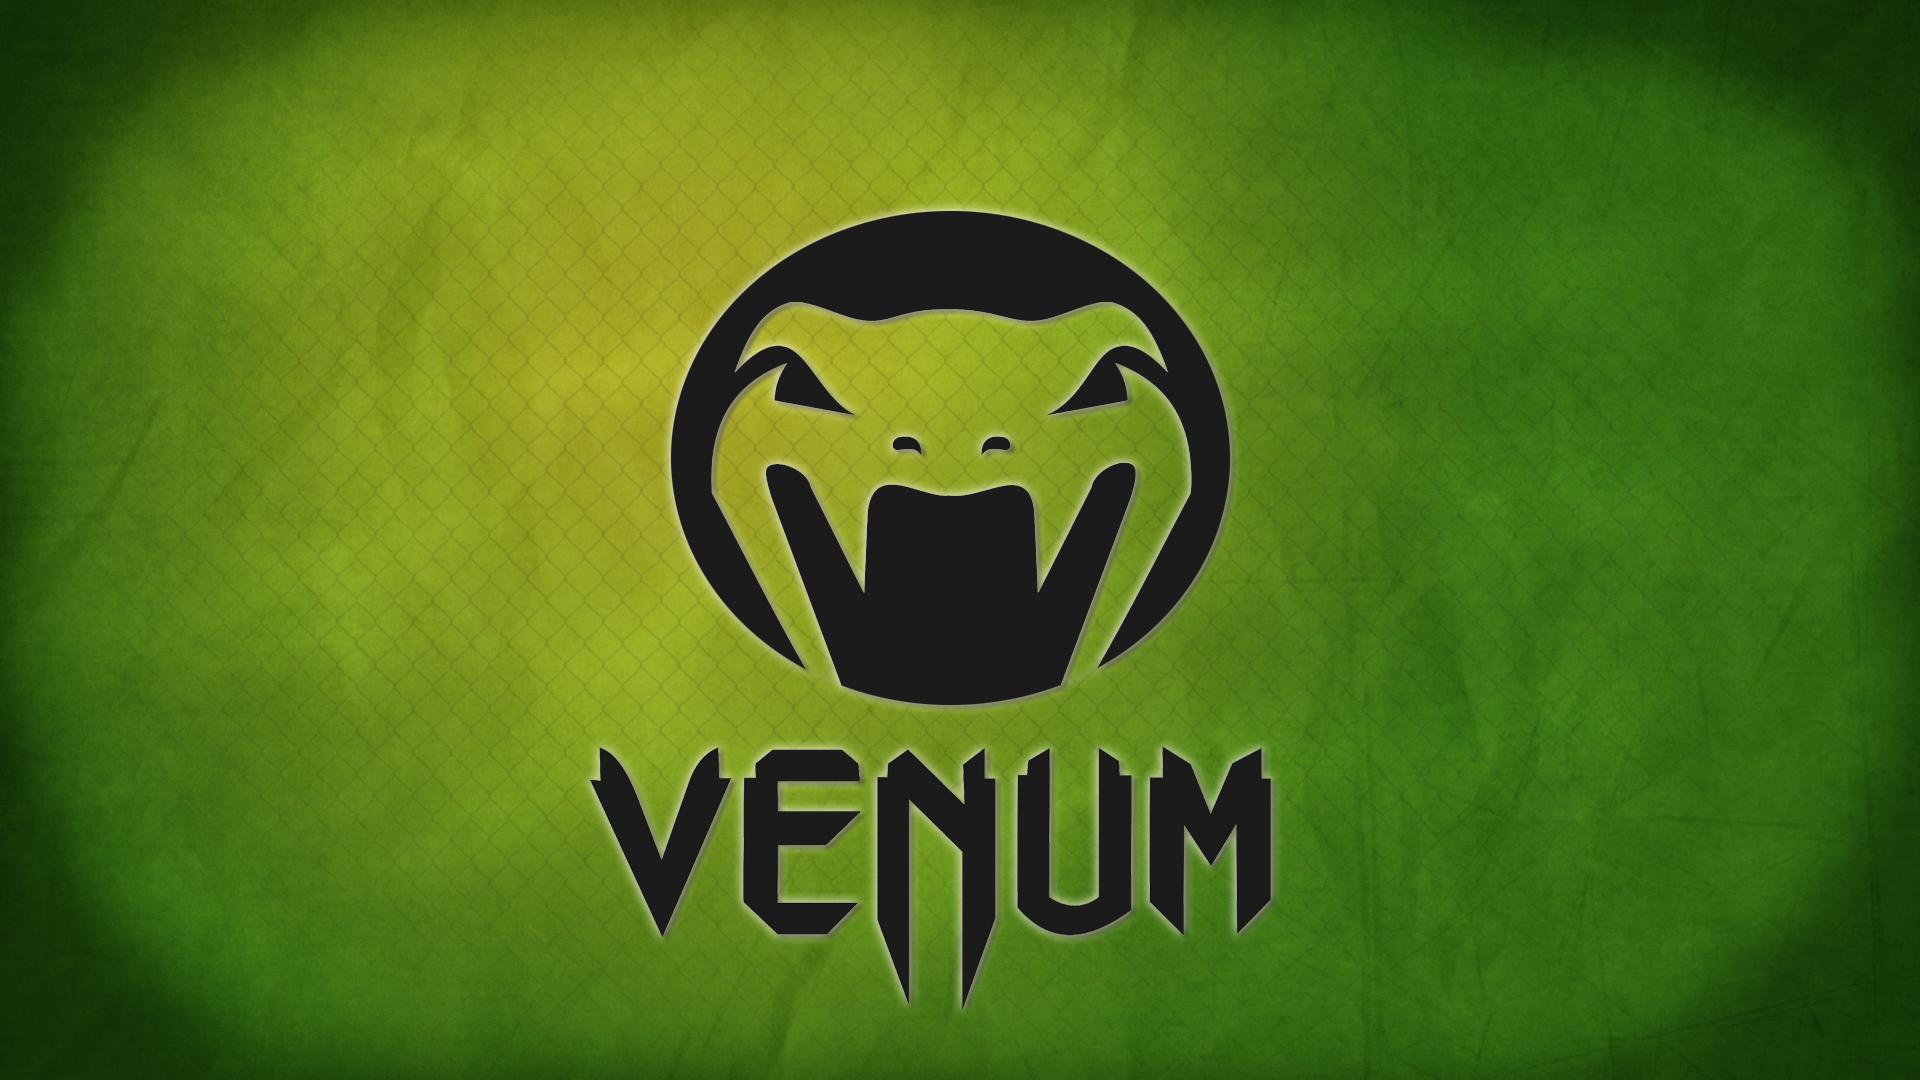 Engers ufc mma logo peleas venum 2012 wallpaper   ForWallpapercom 1920x1080